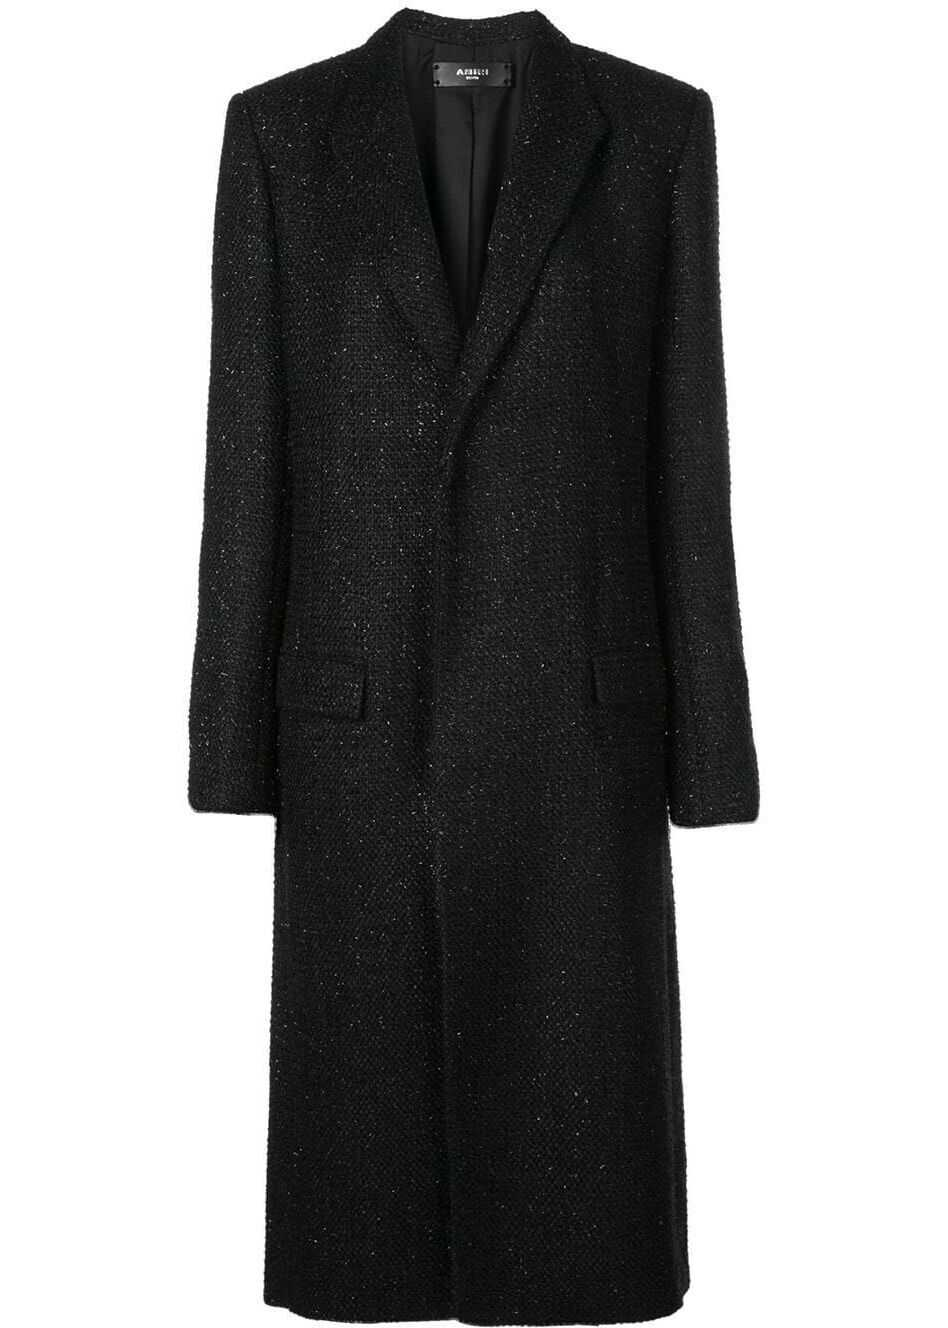 AMIRI Polyester Coat BLACK